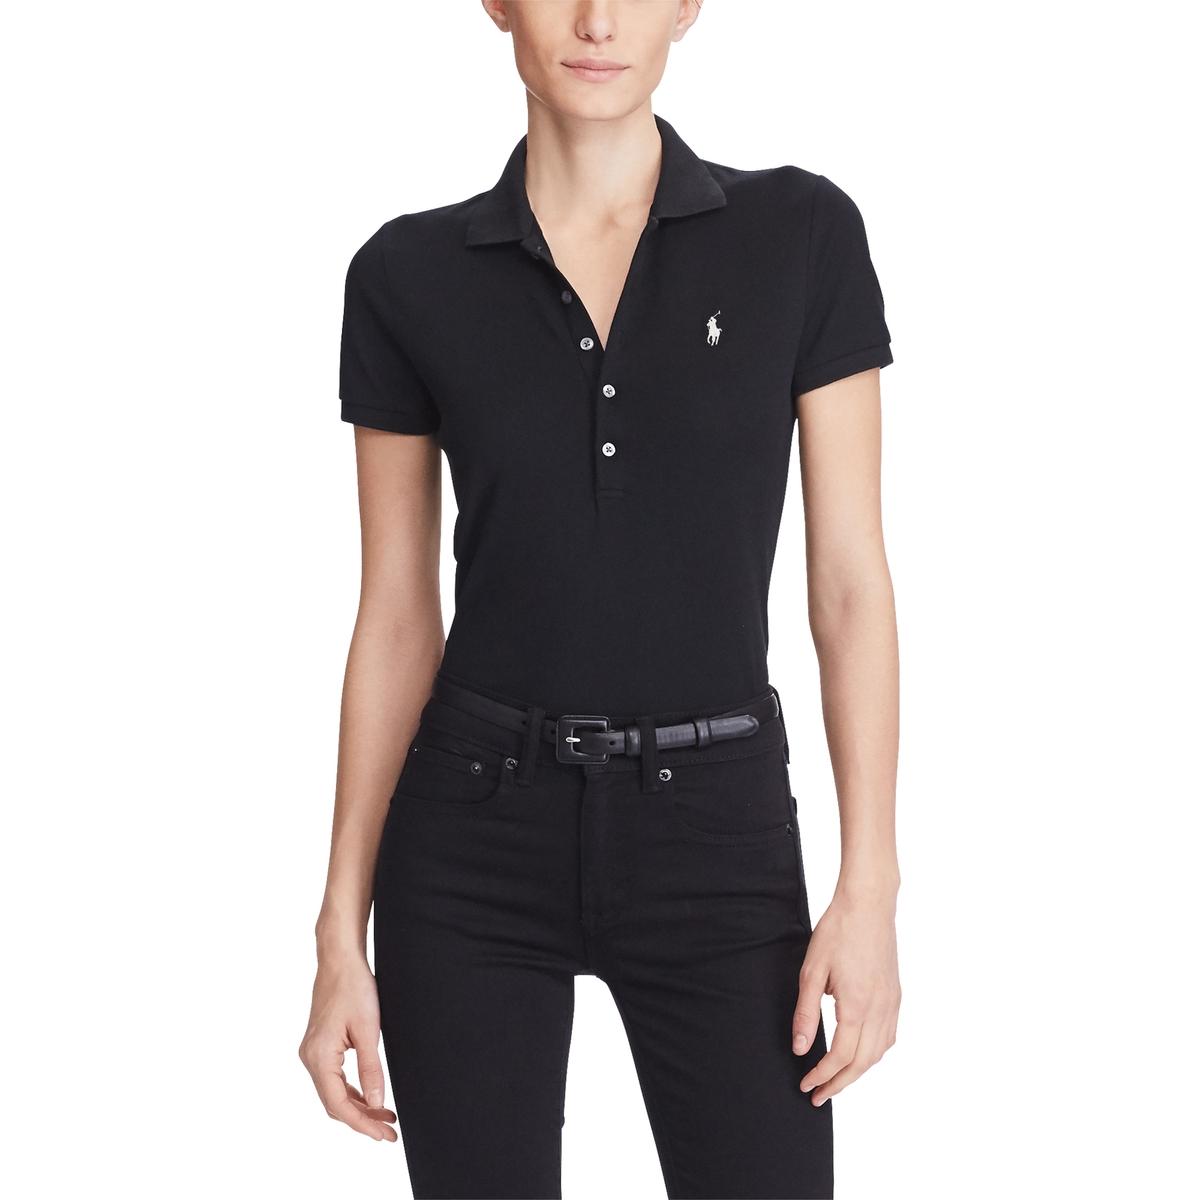 Футболка-поло La Redoute С короткими рукавами L черный футболка поло la redoute с короткими рукавами xs белый